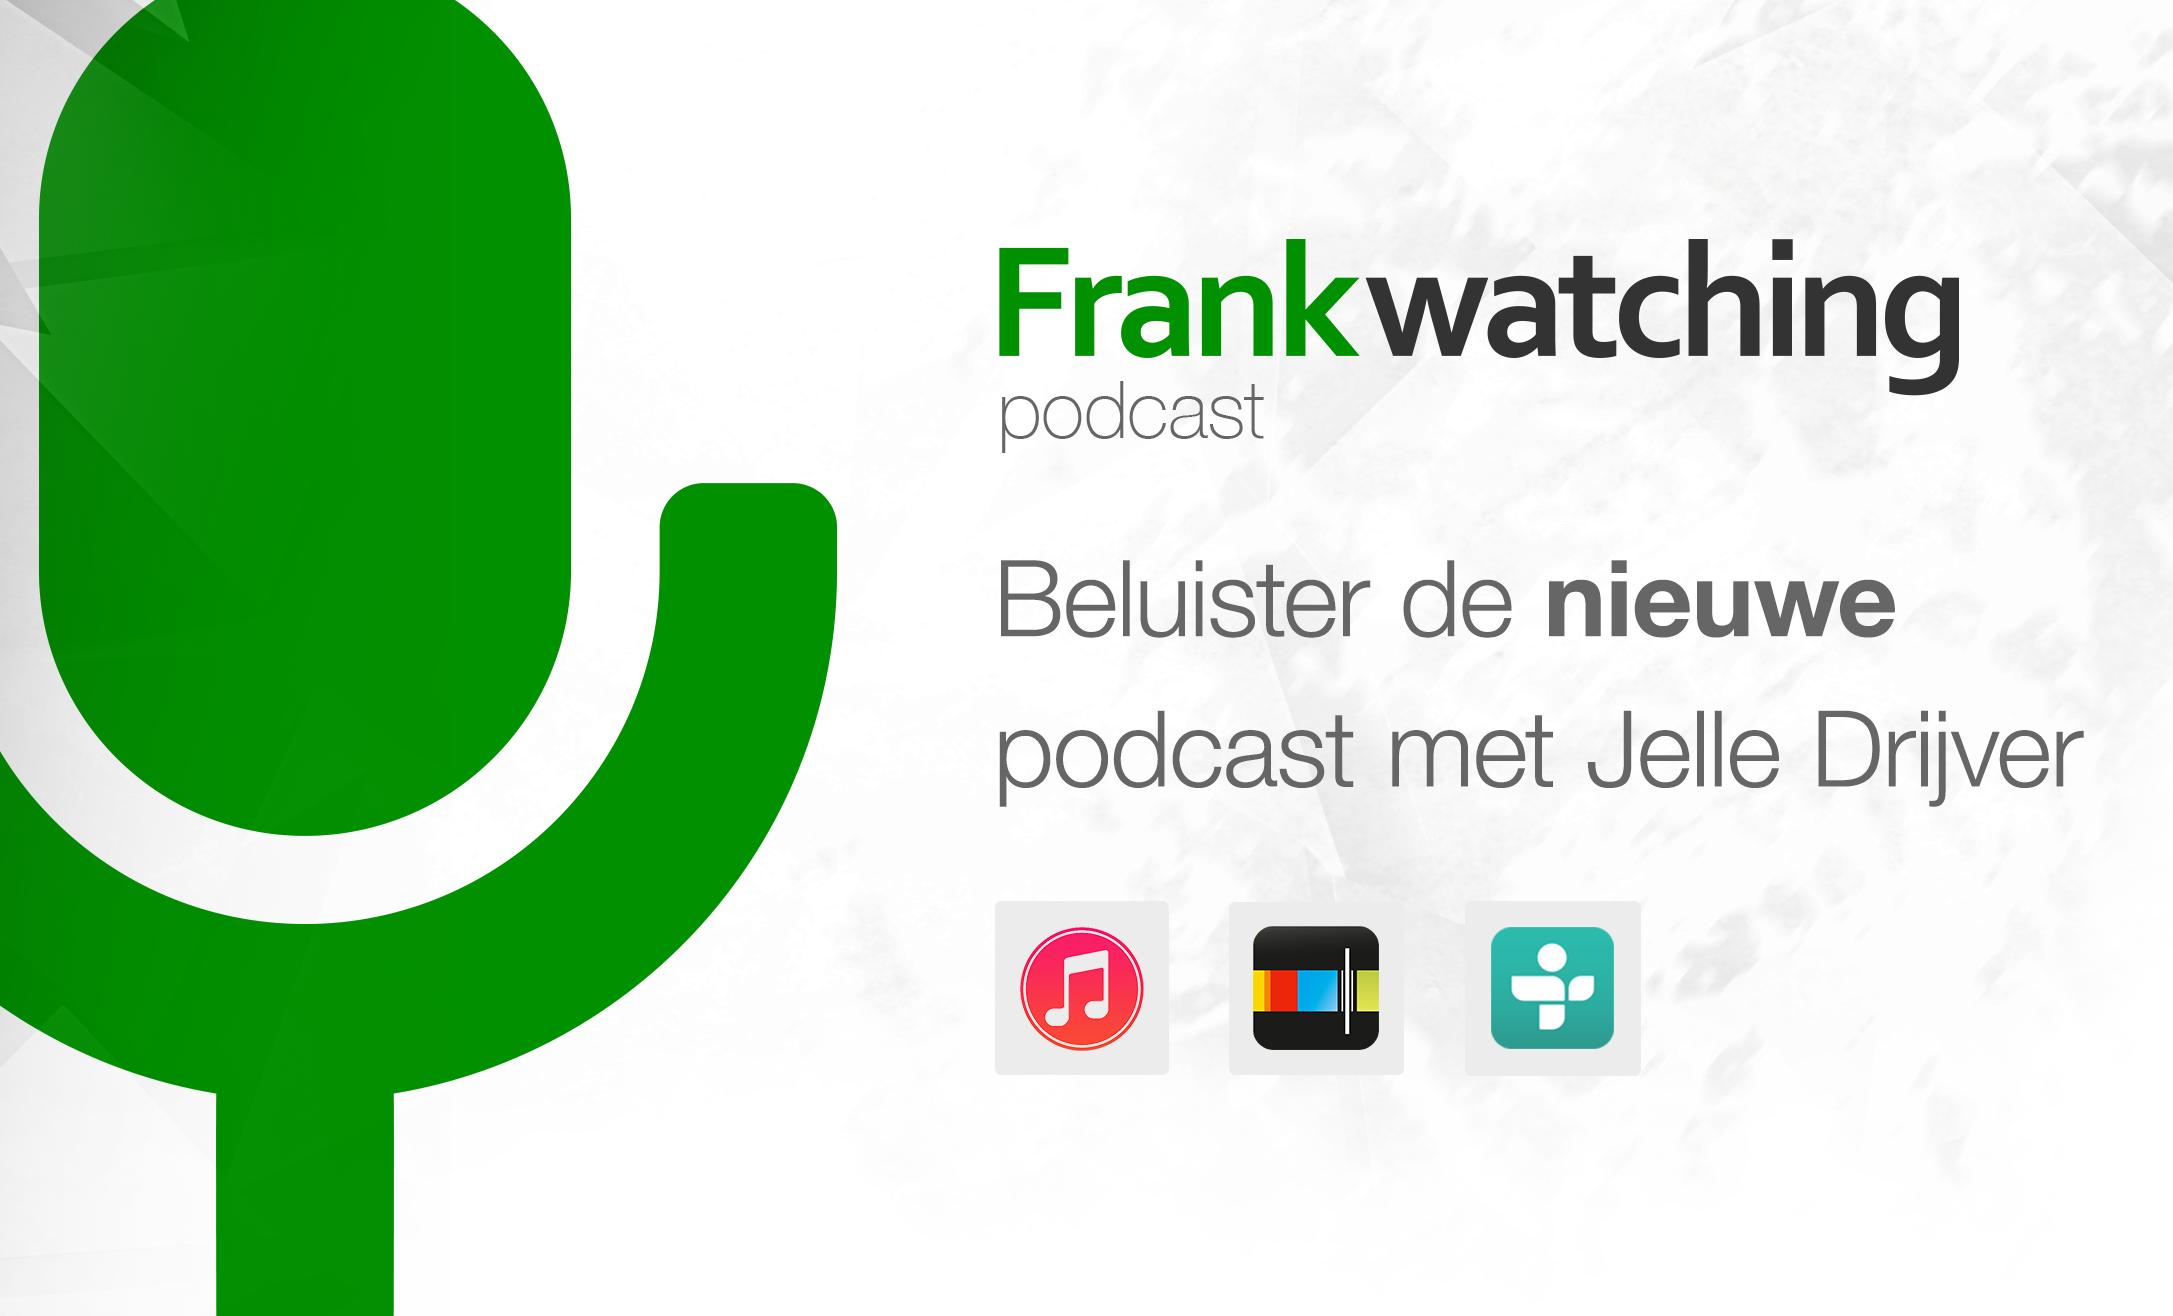 Frankwatching Podcast